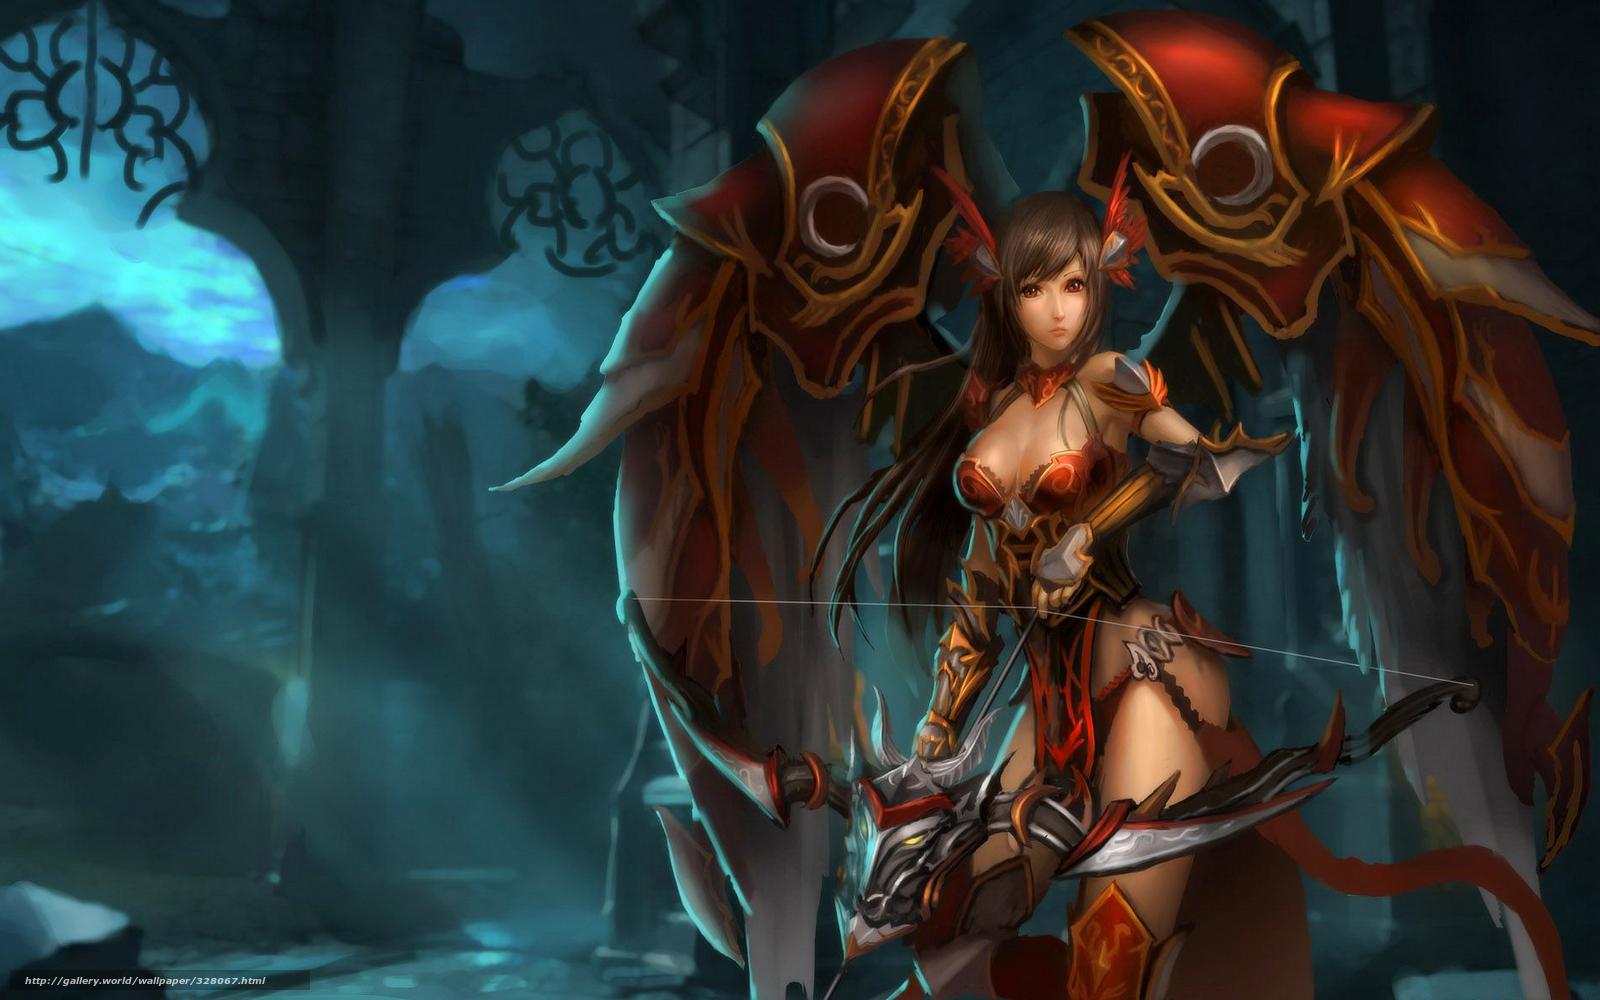 Nude fantisy warrior girls exposed scene